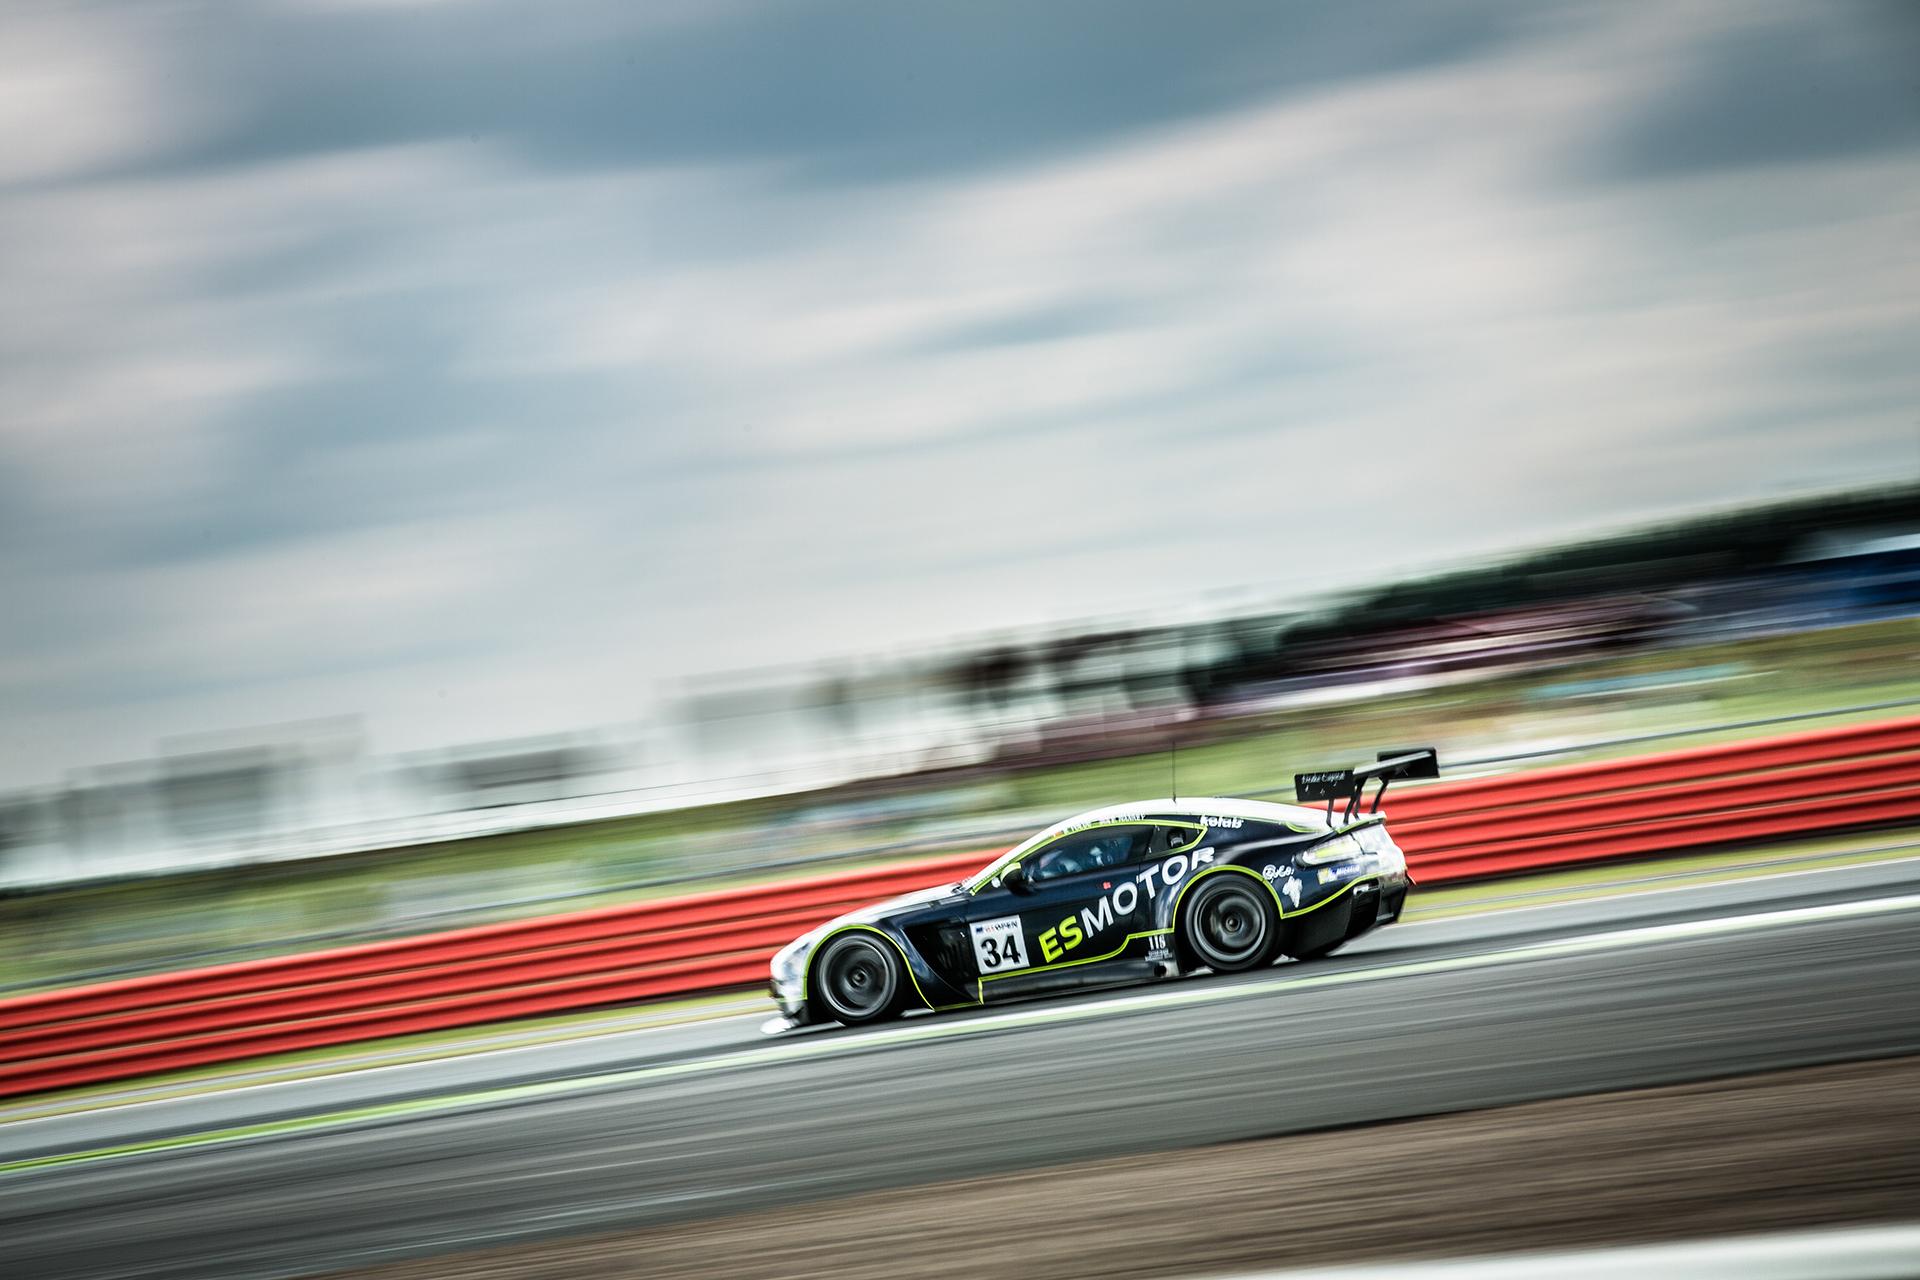 2016-IntGTOpen- Silverstone-50340.jpg